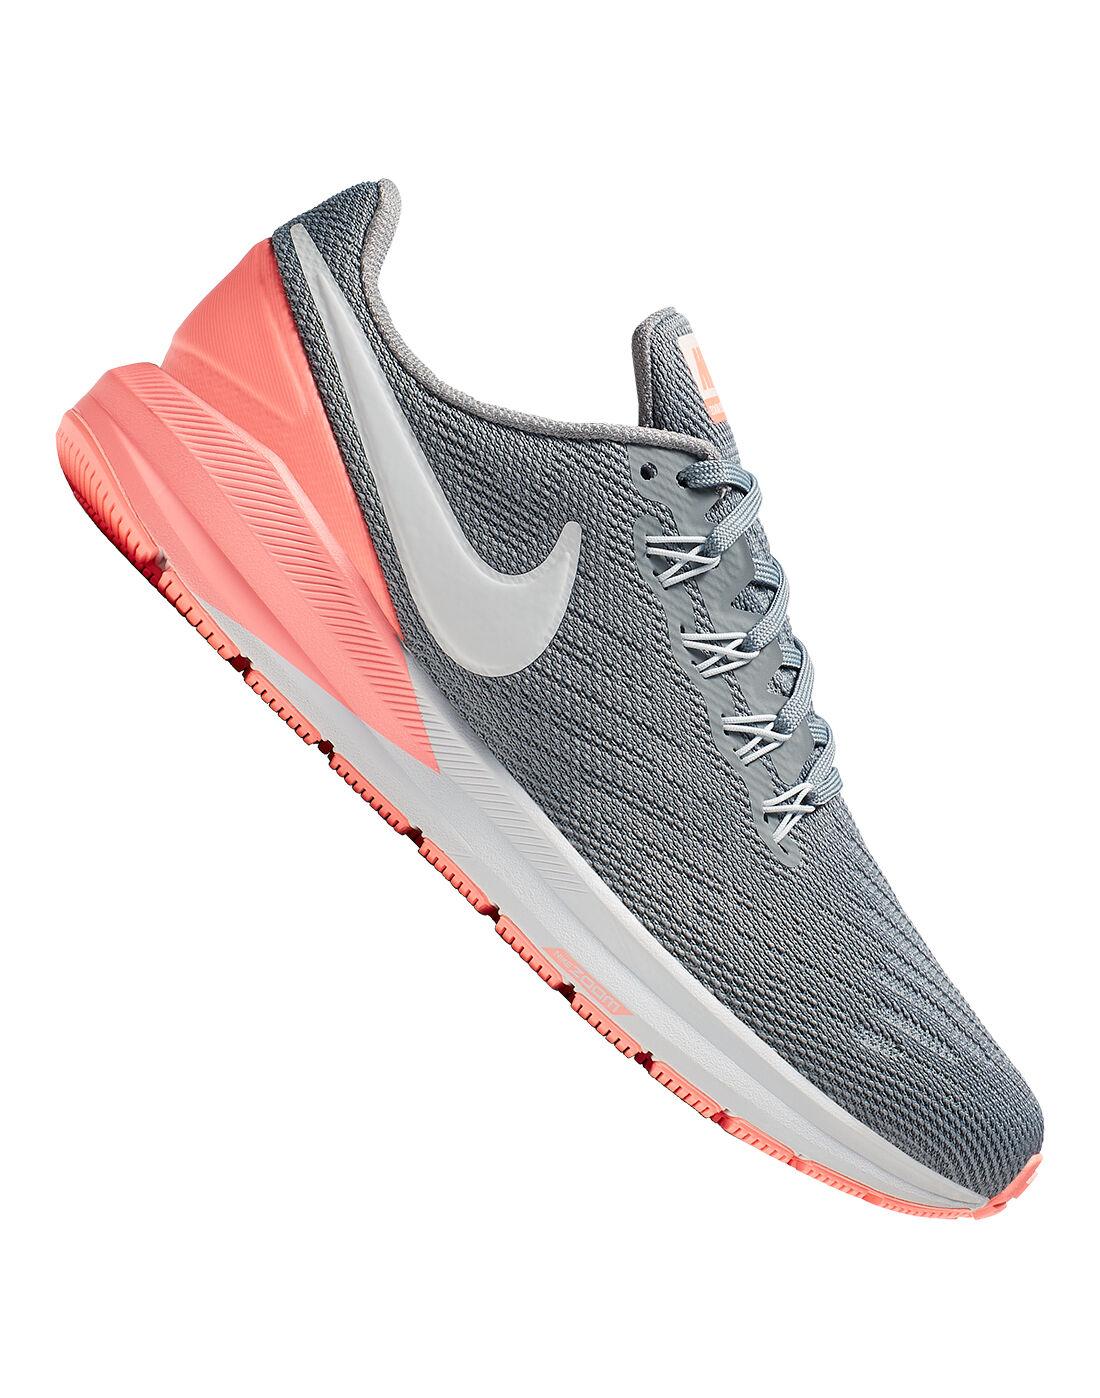 Grey \u0026 Peach Nike Air Zoom Structure 22